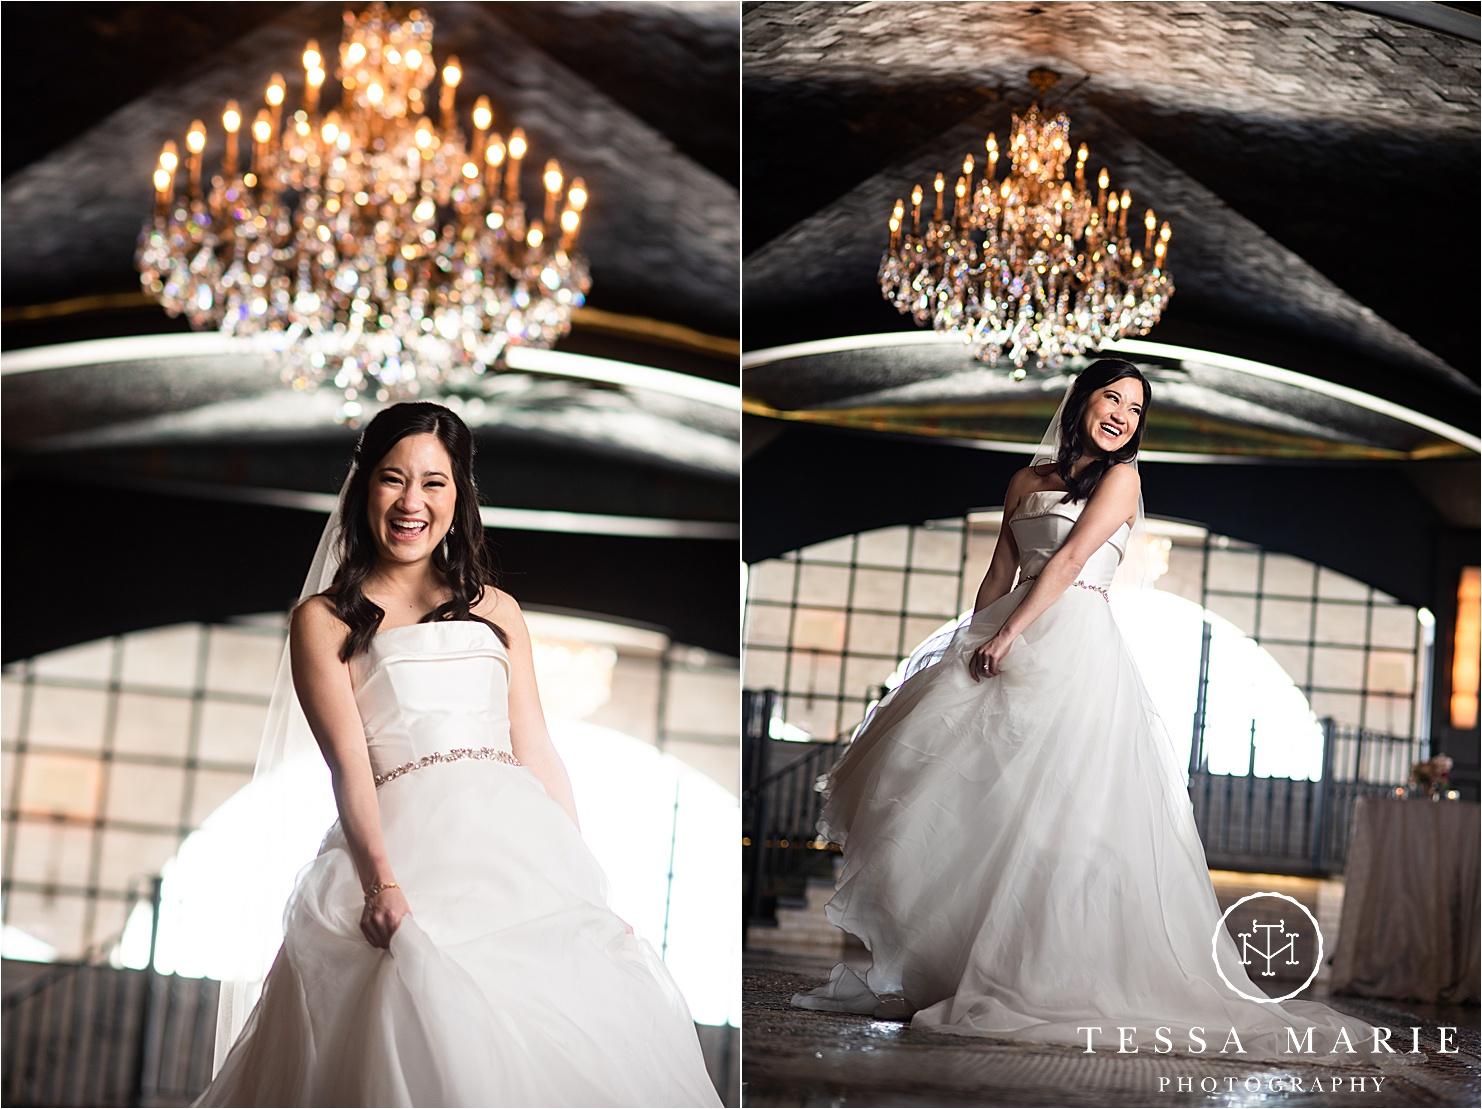 Tessa_marie_weddings_houston_wedding_photographer_The_astorian_0074.jpg